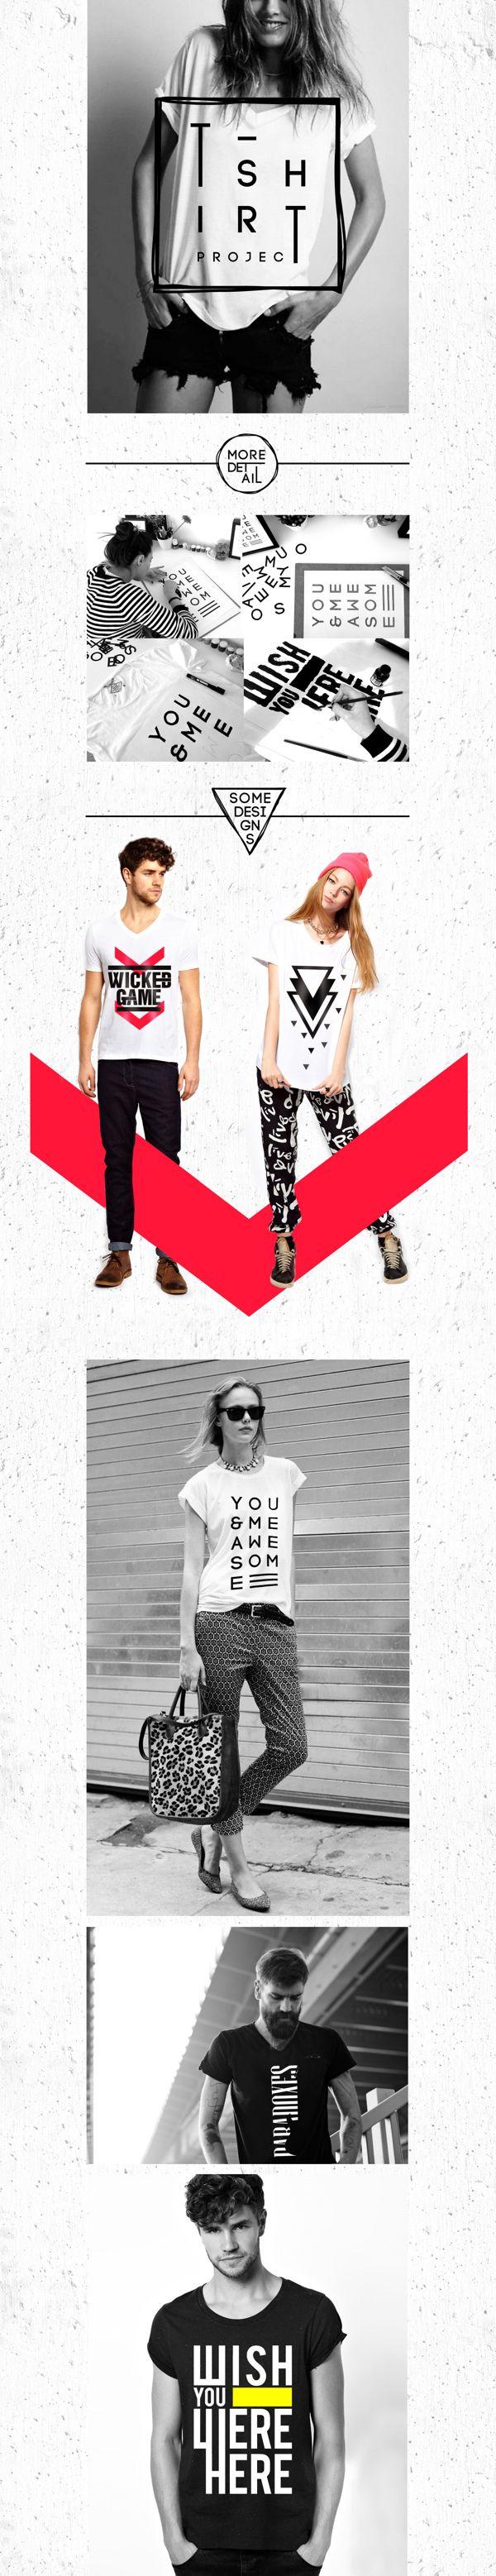 T-shirt design by Tugba Guler via Behance. I really like how she combines geometric elements with type.